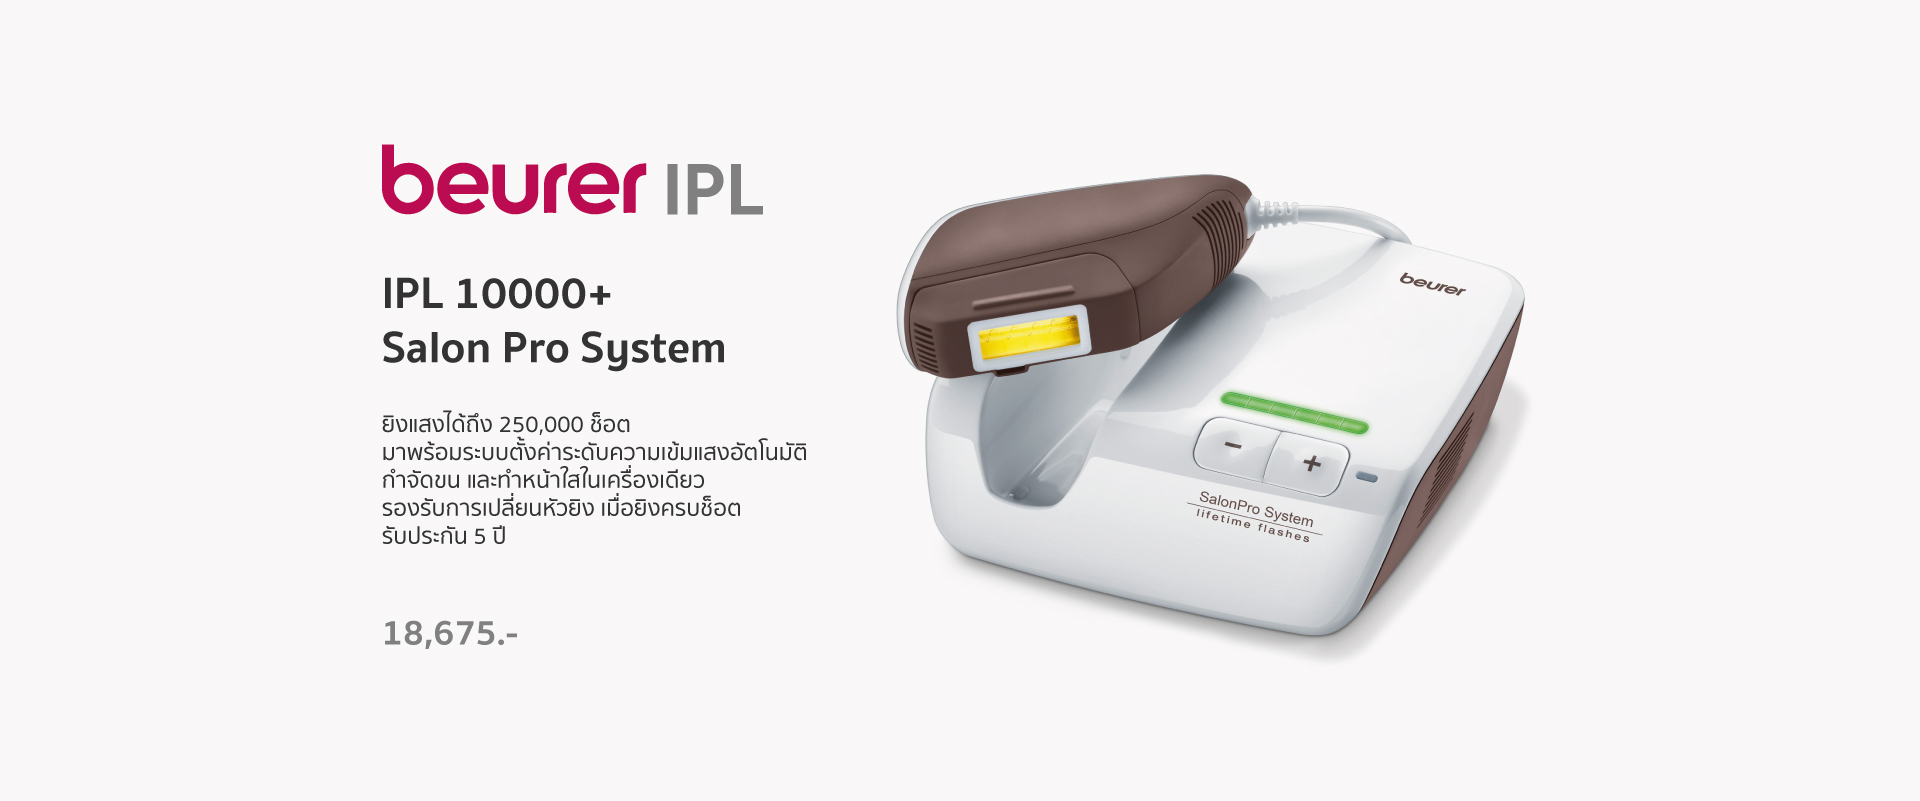 Beurer-IPL-10000+